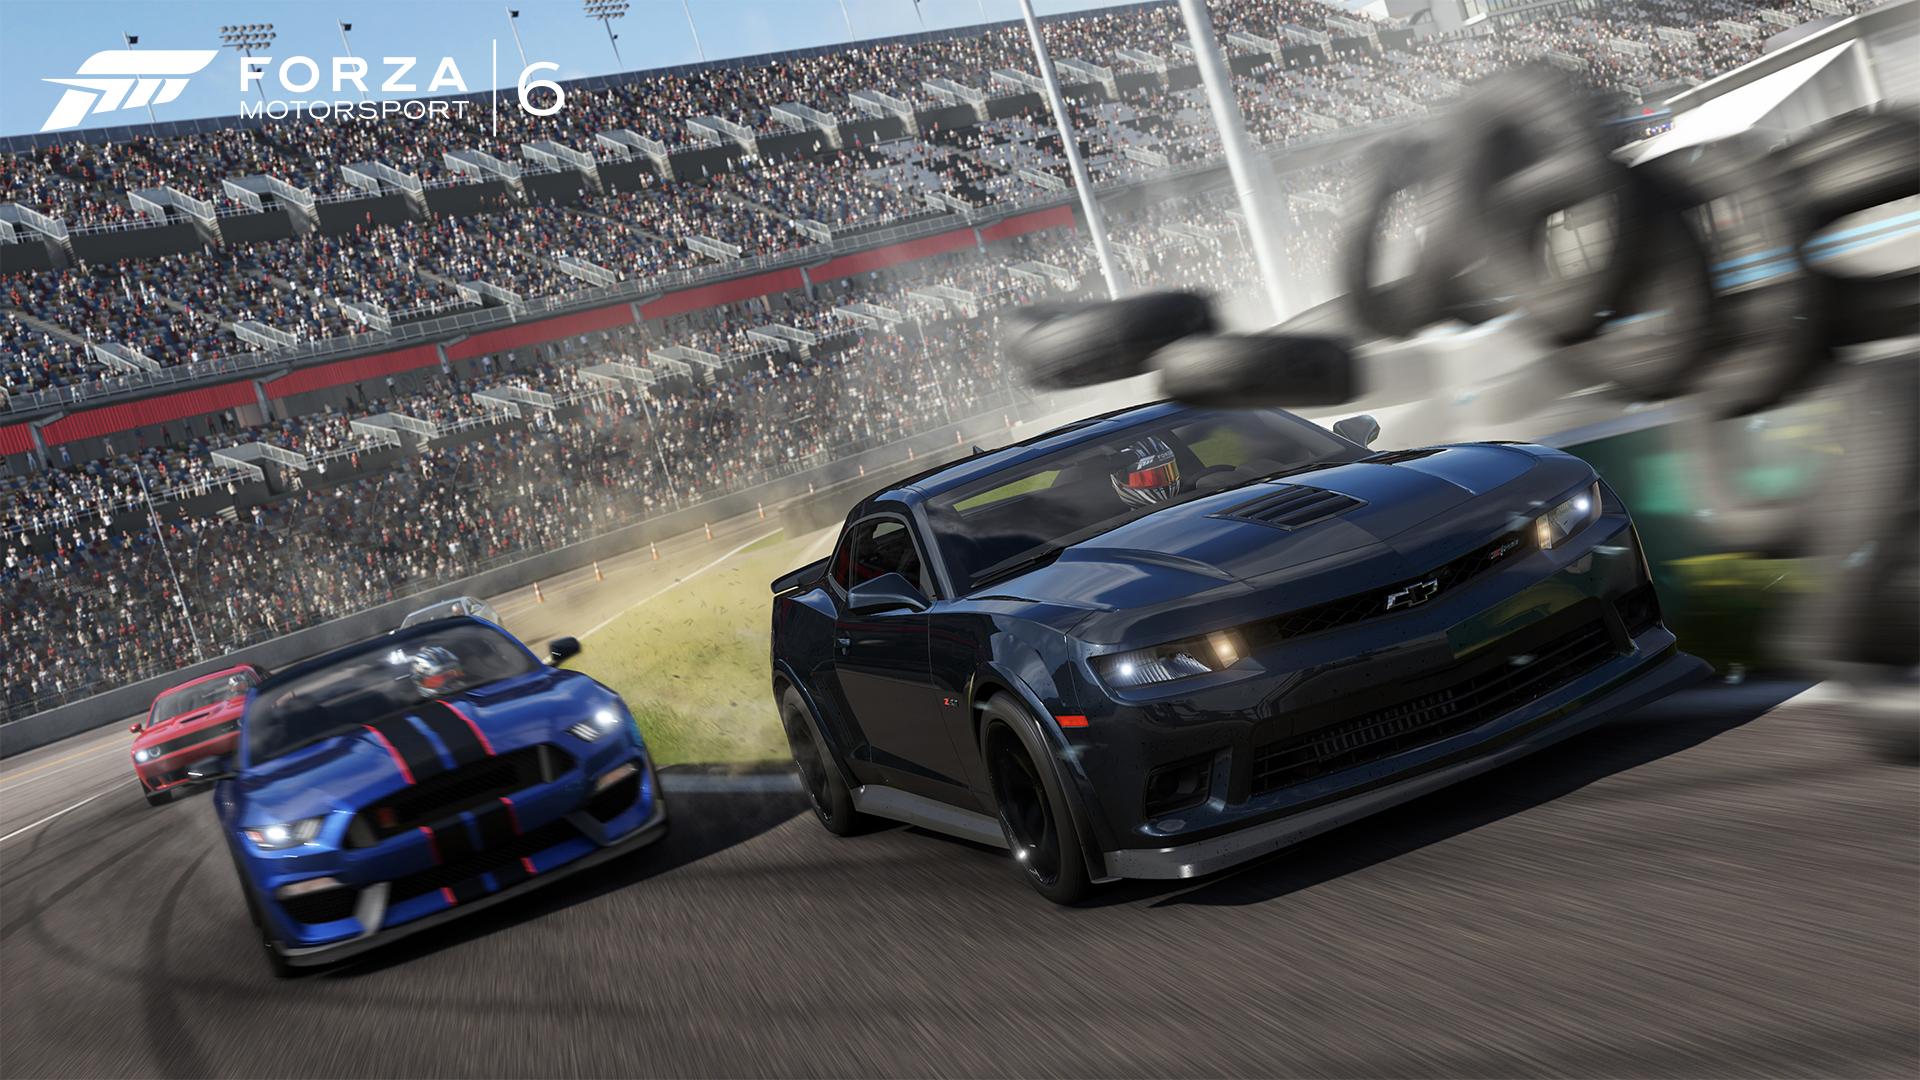 Xbox One Forza  Cars Corvette Crash